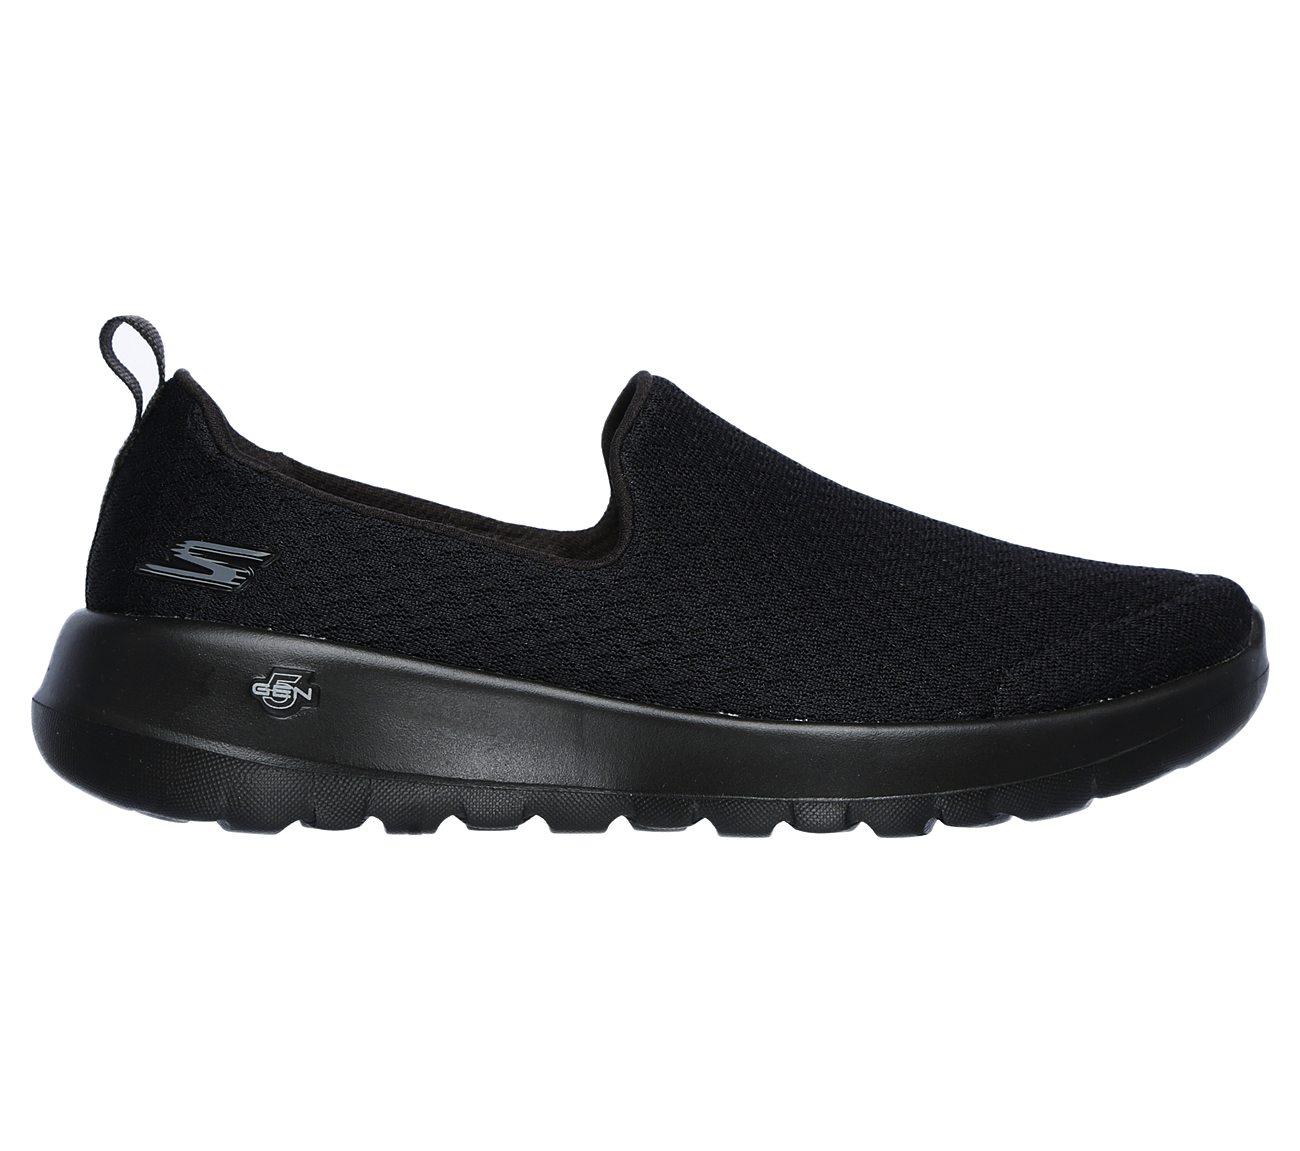 Buy SKECHERS Skechers GOwalk Joy Skechers Performance Shoes tok3R